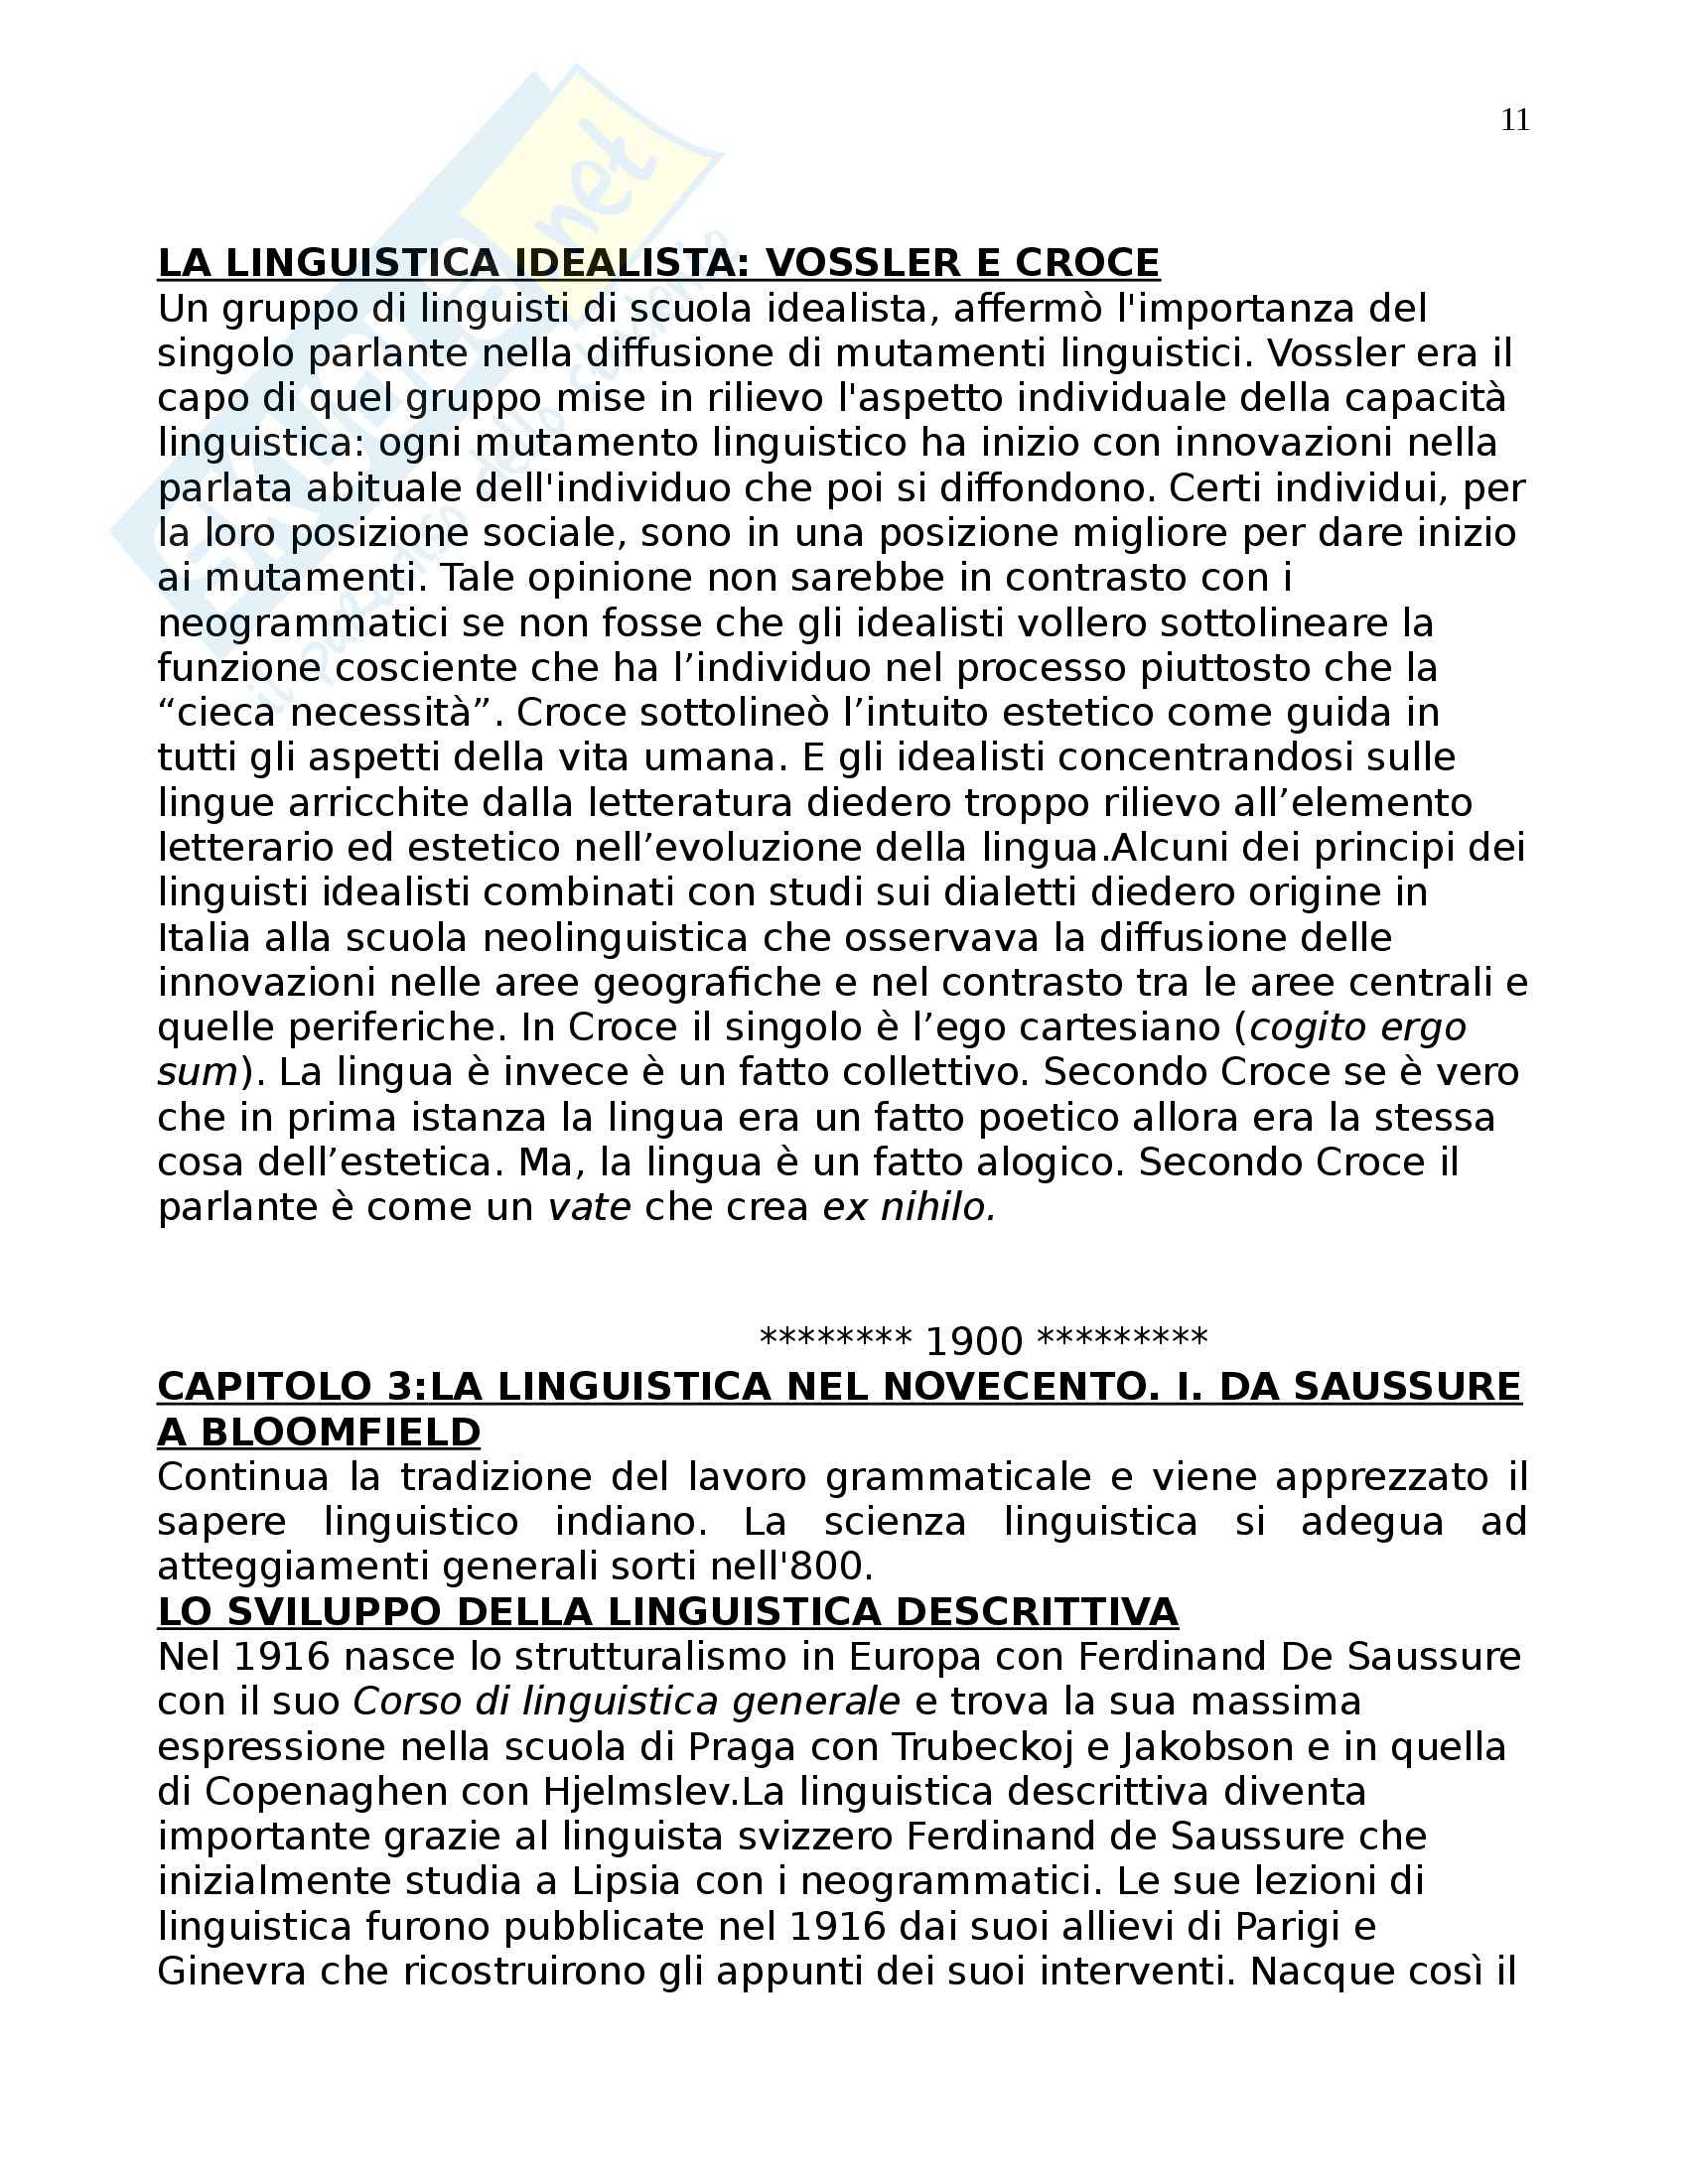 Riassunto esame Linguistica Generale, prof. Assenza, libro consigliato La Linguistica Moderna, Robins Pag. 11